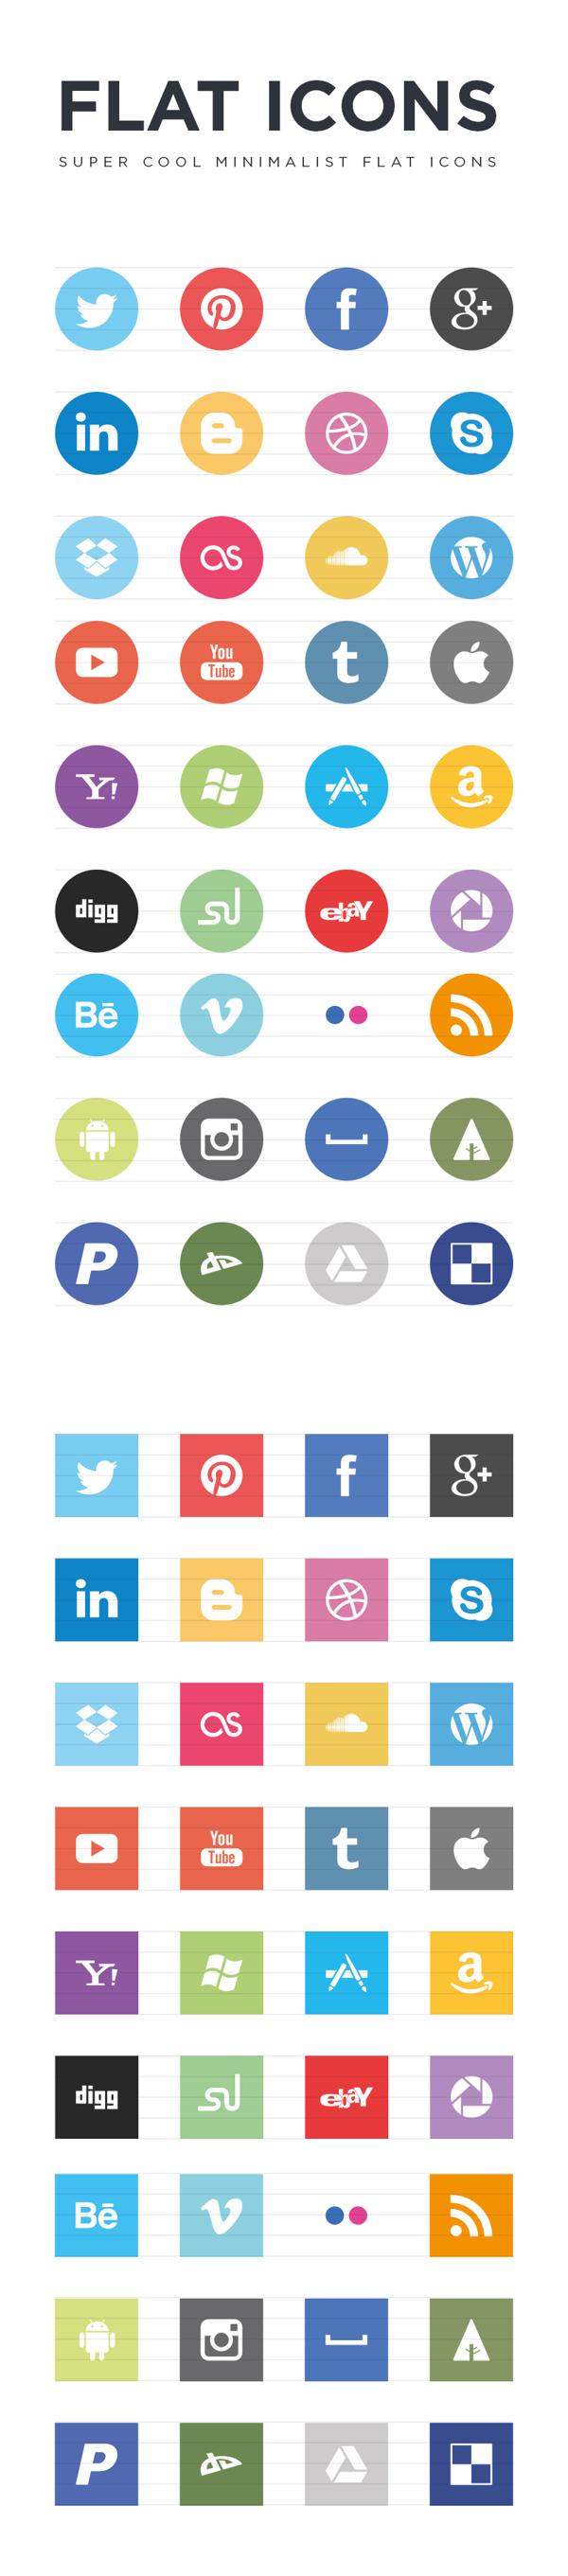 Cool minimalist Flat social icons